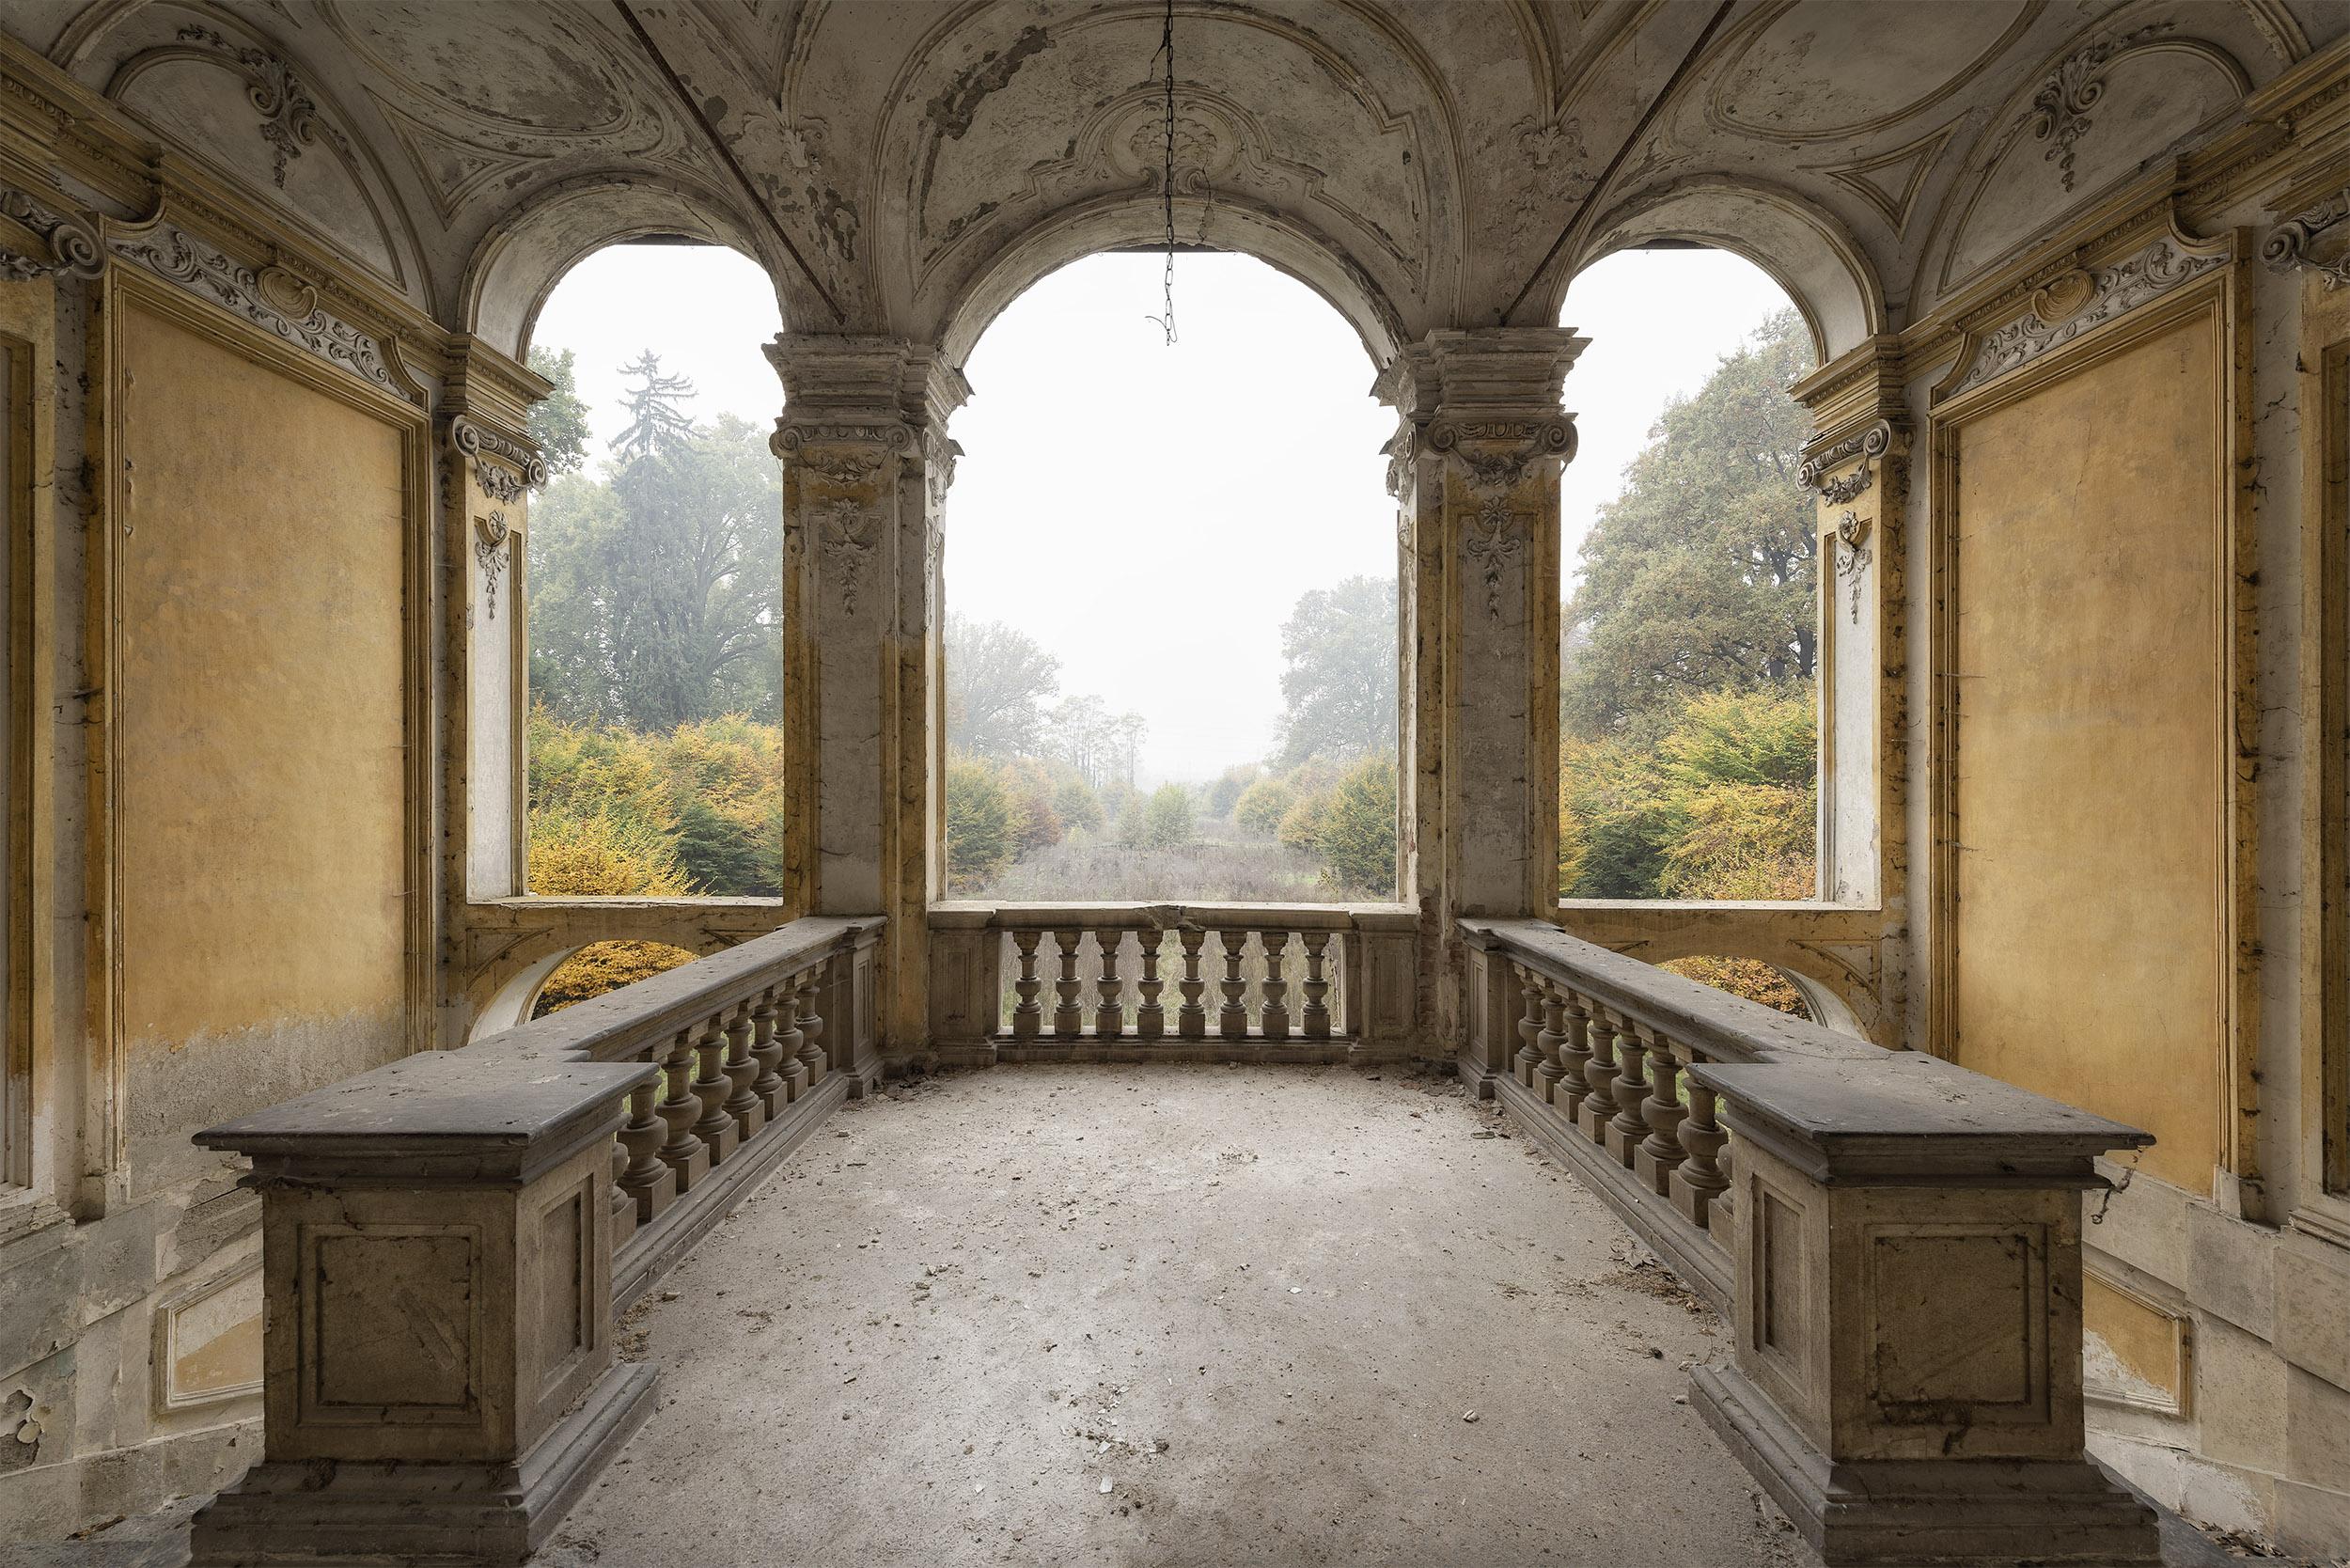 Peter Untermaierhofer ArtShouldTempt Photography Pic 5